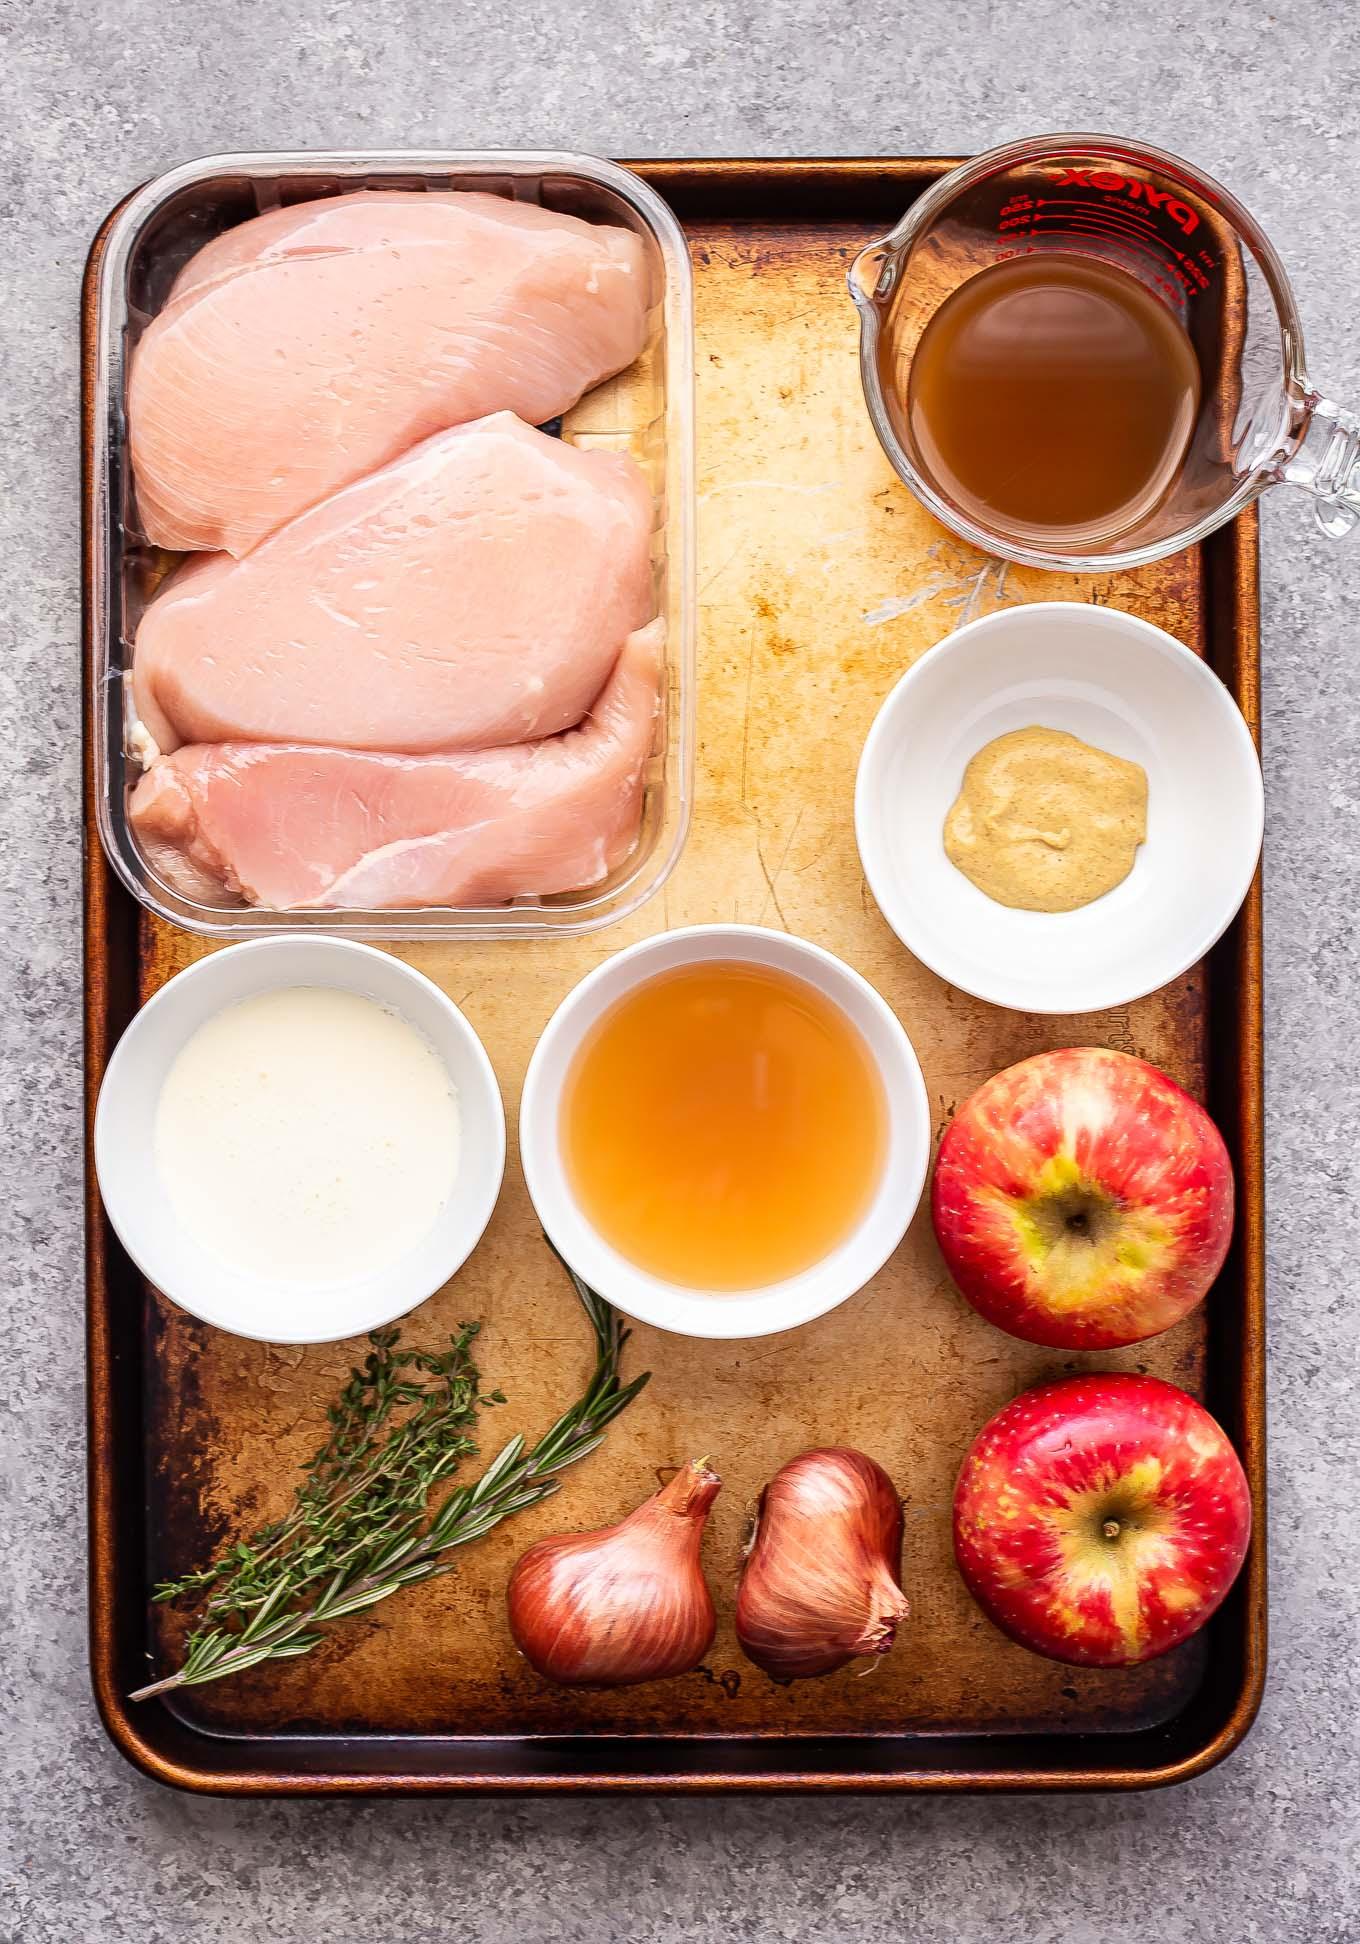 Ingredients for Apple cider chicken skillet on a sheet pan